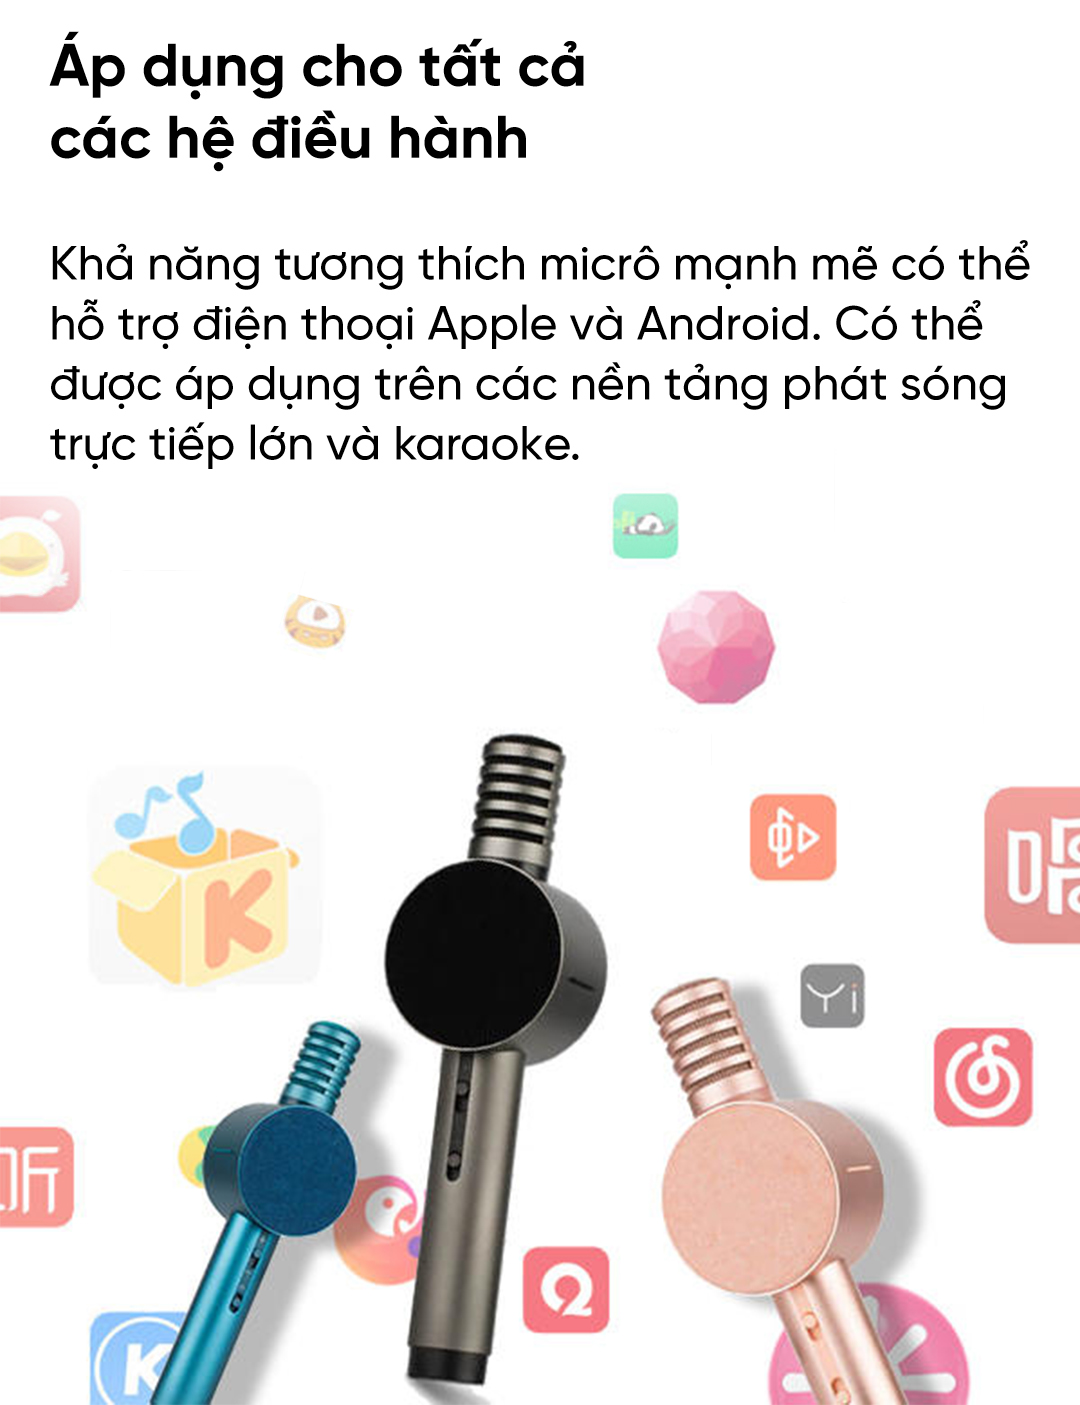 mic-karaoke-kem-loa-bluetooth-6